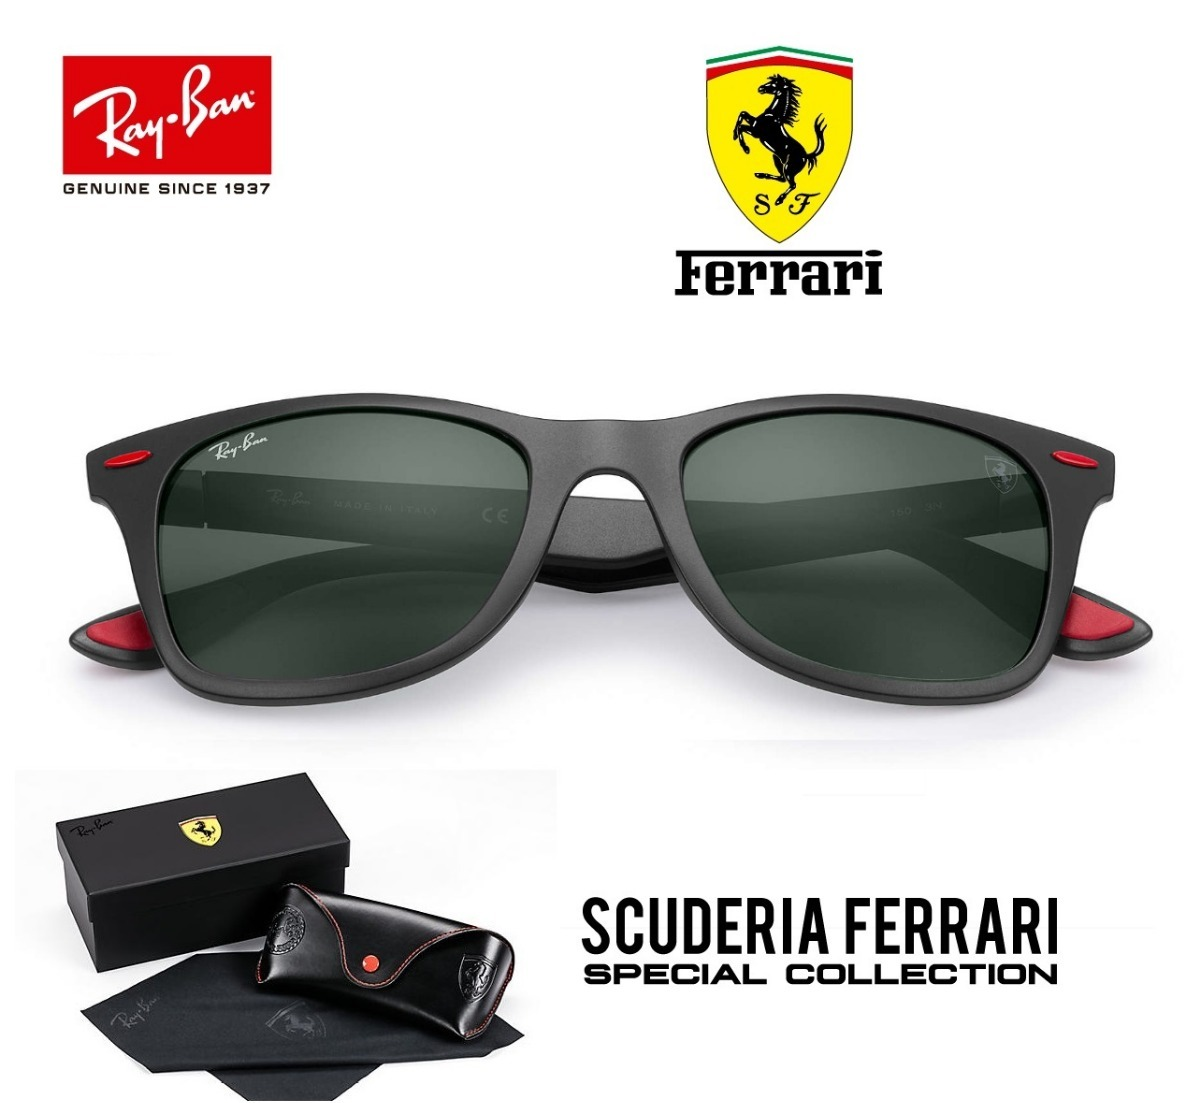 Óculos Ray Ban Rb4195 Wayfarer Liteforce Ferrari - R  299,00 em ... 5af23093d8